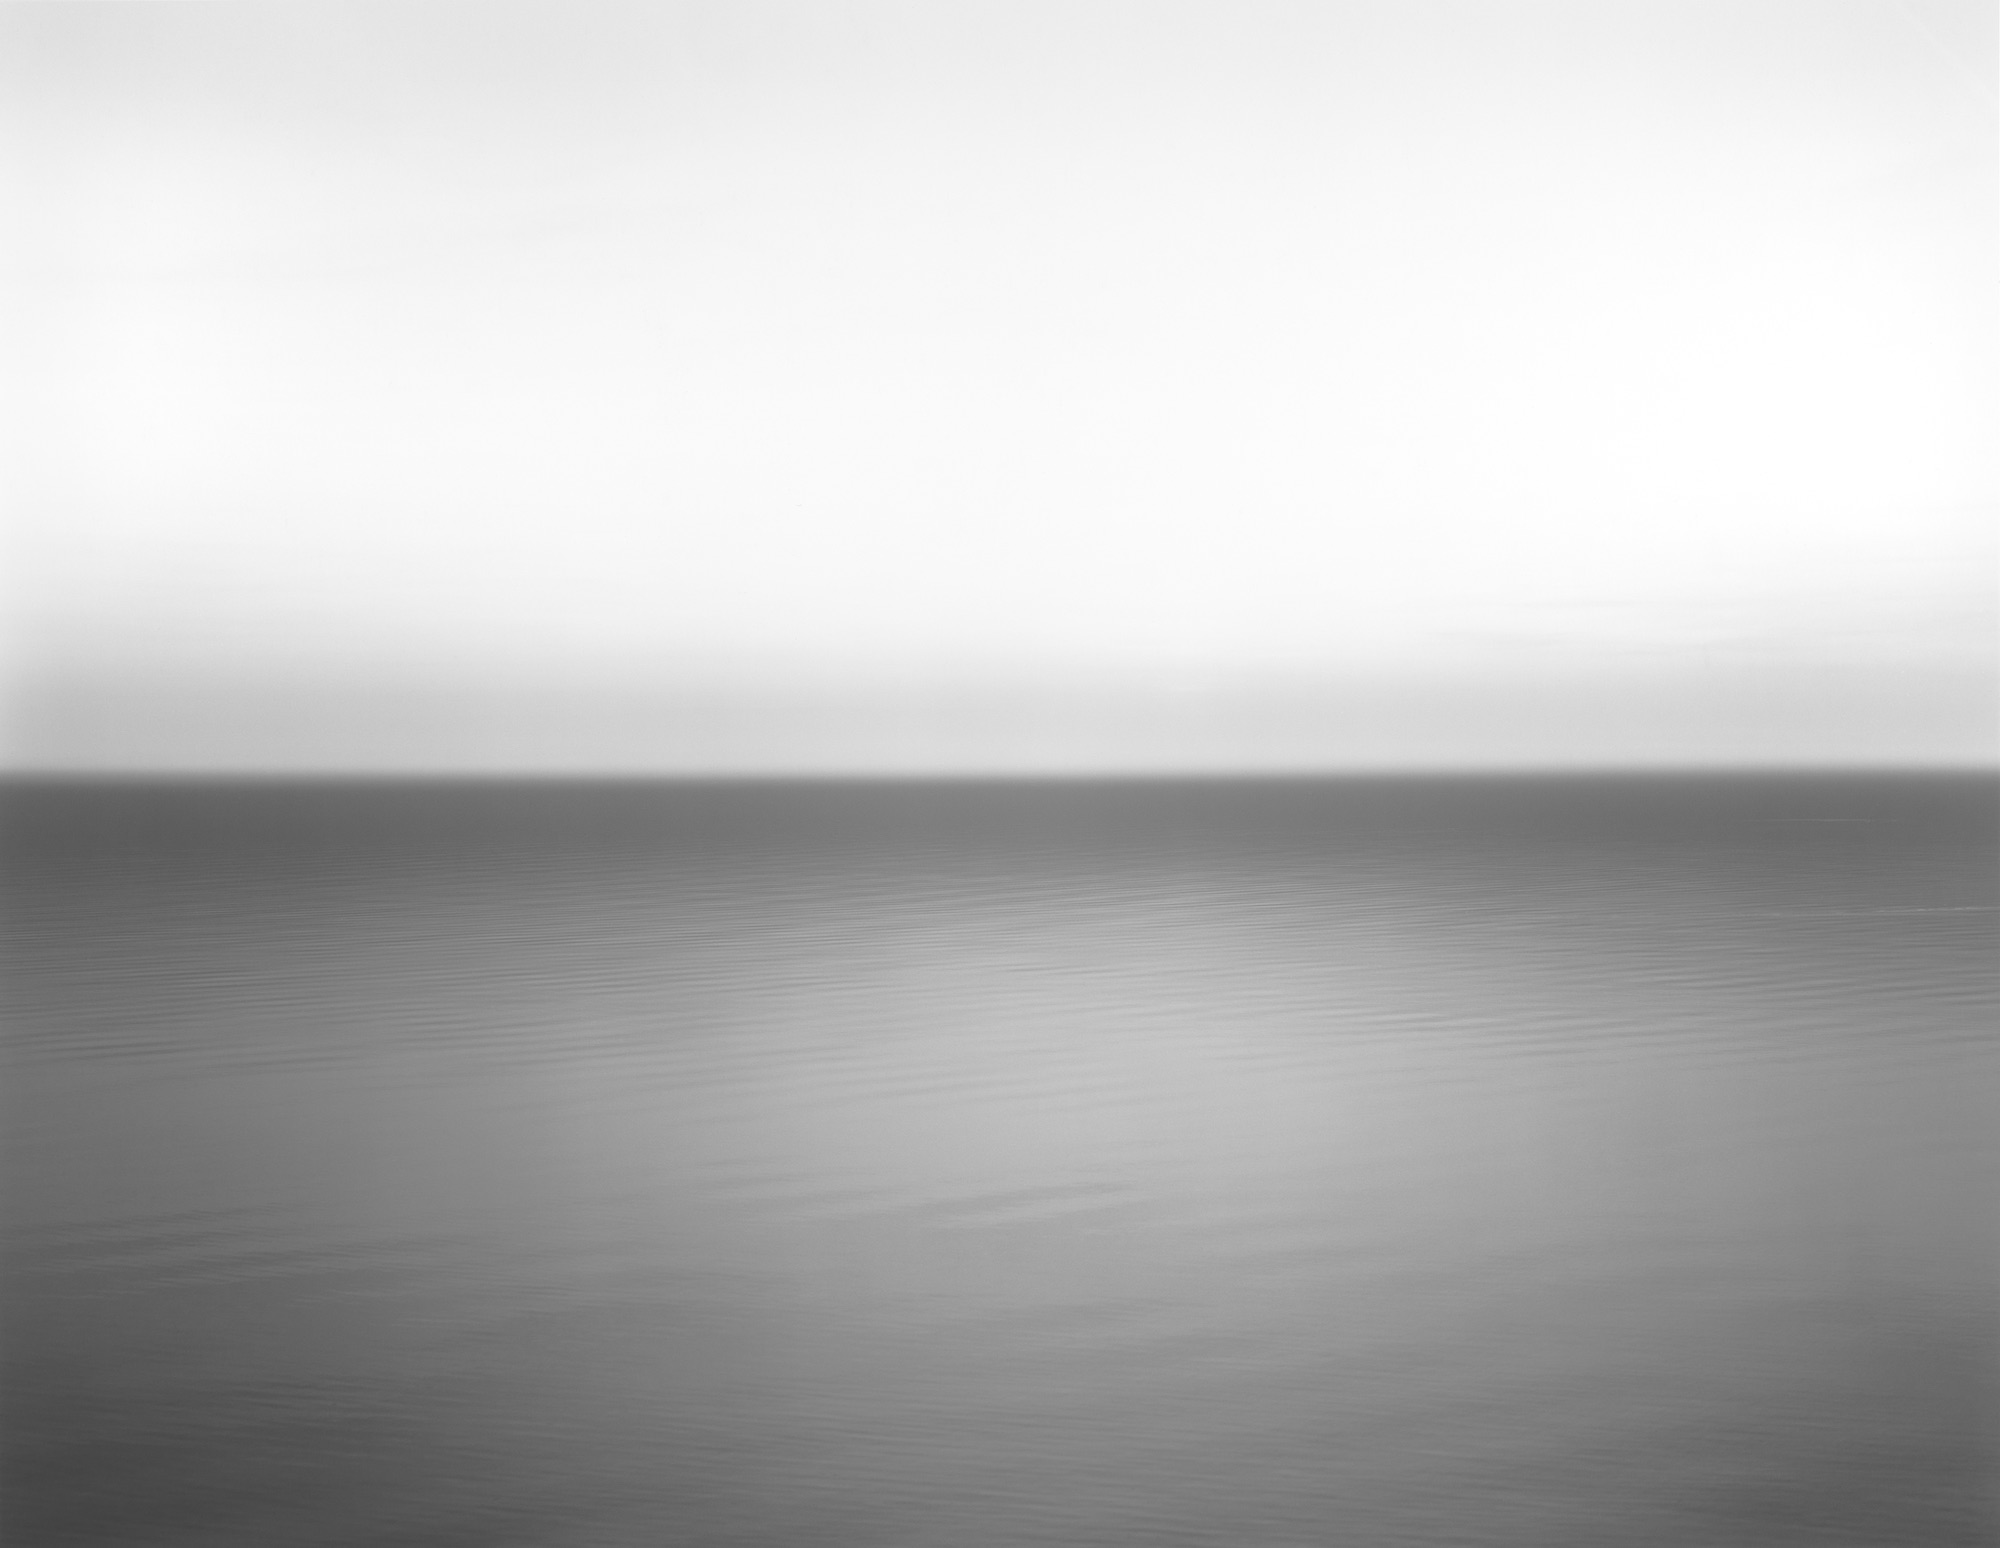 Hiroshi Sugimoto, Boden Sea Uttwil, 1993